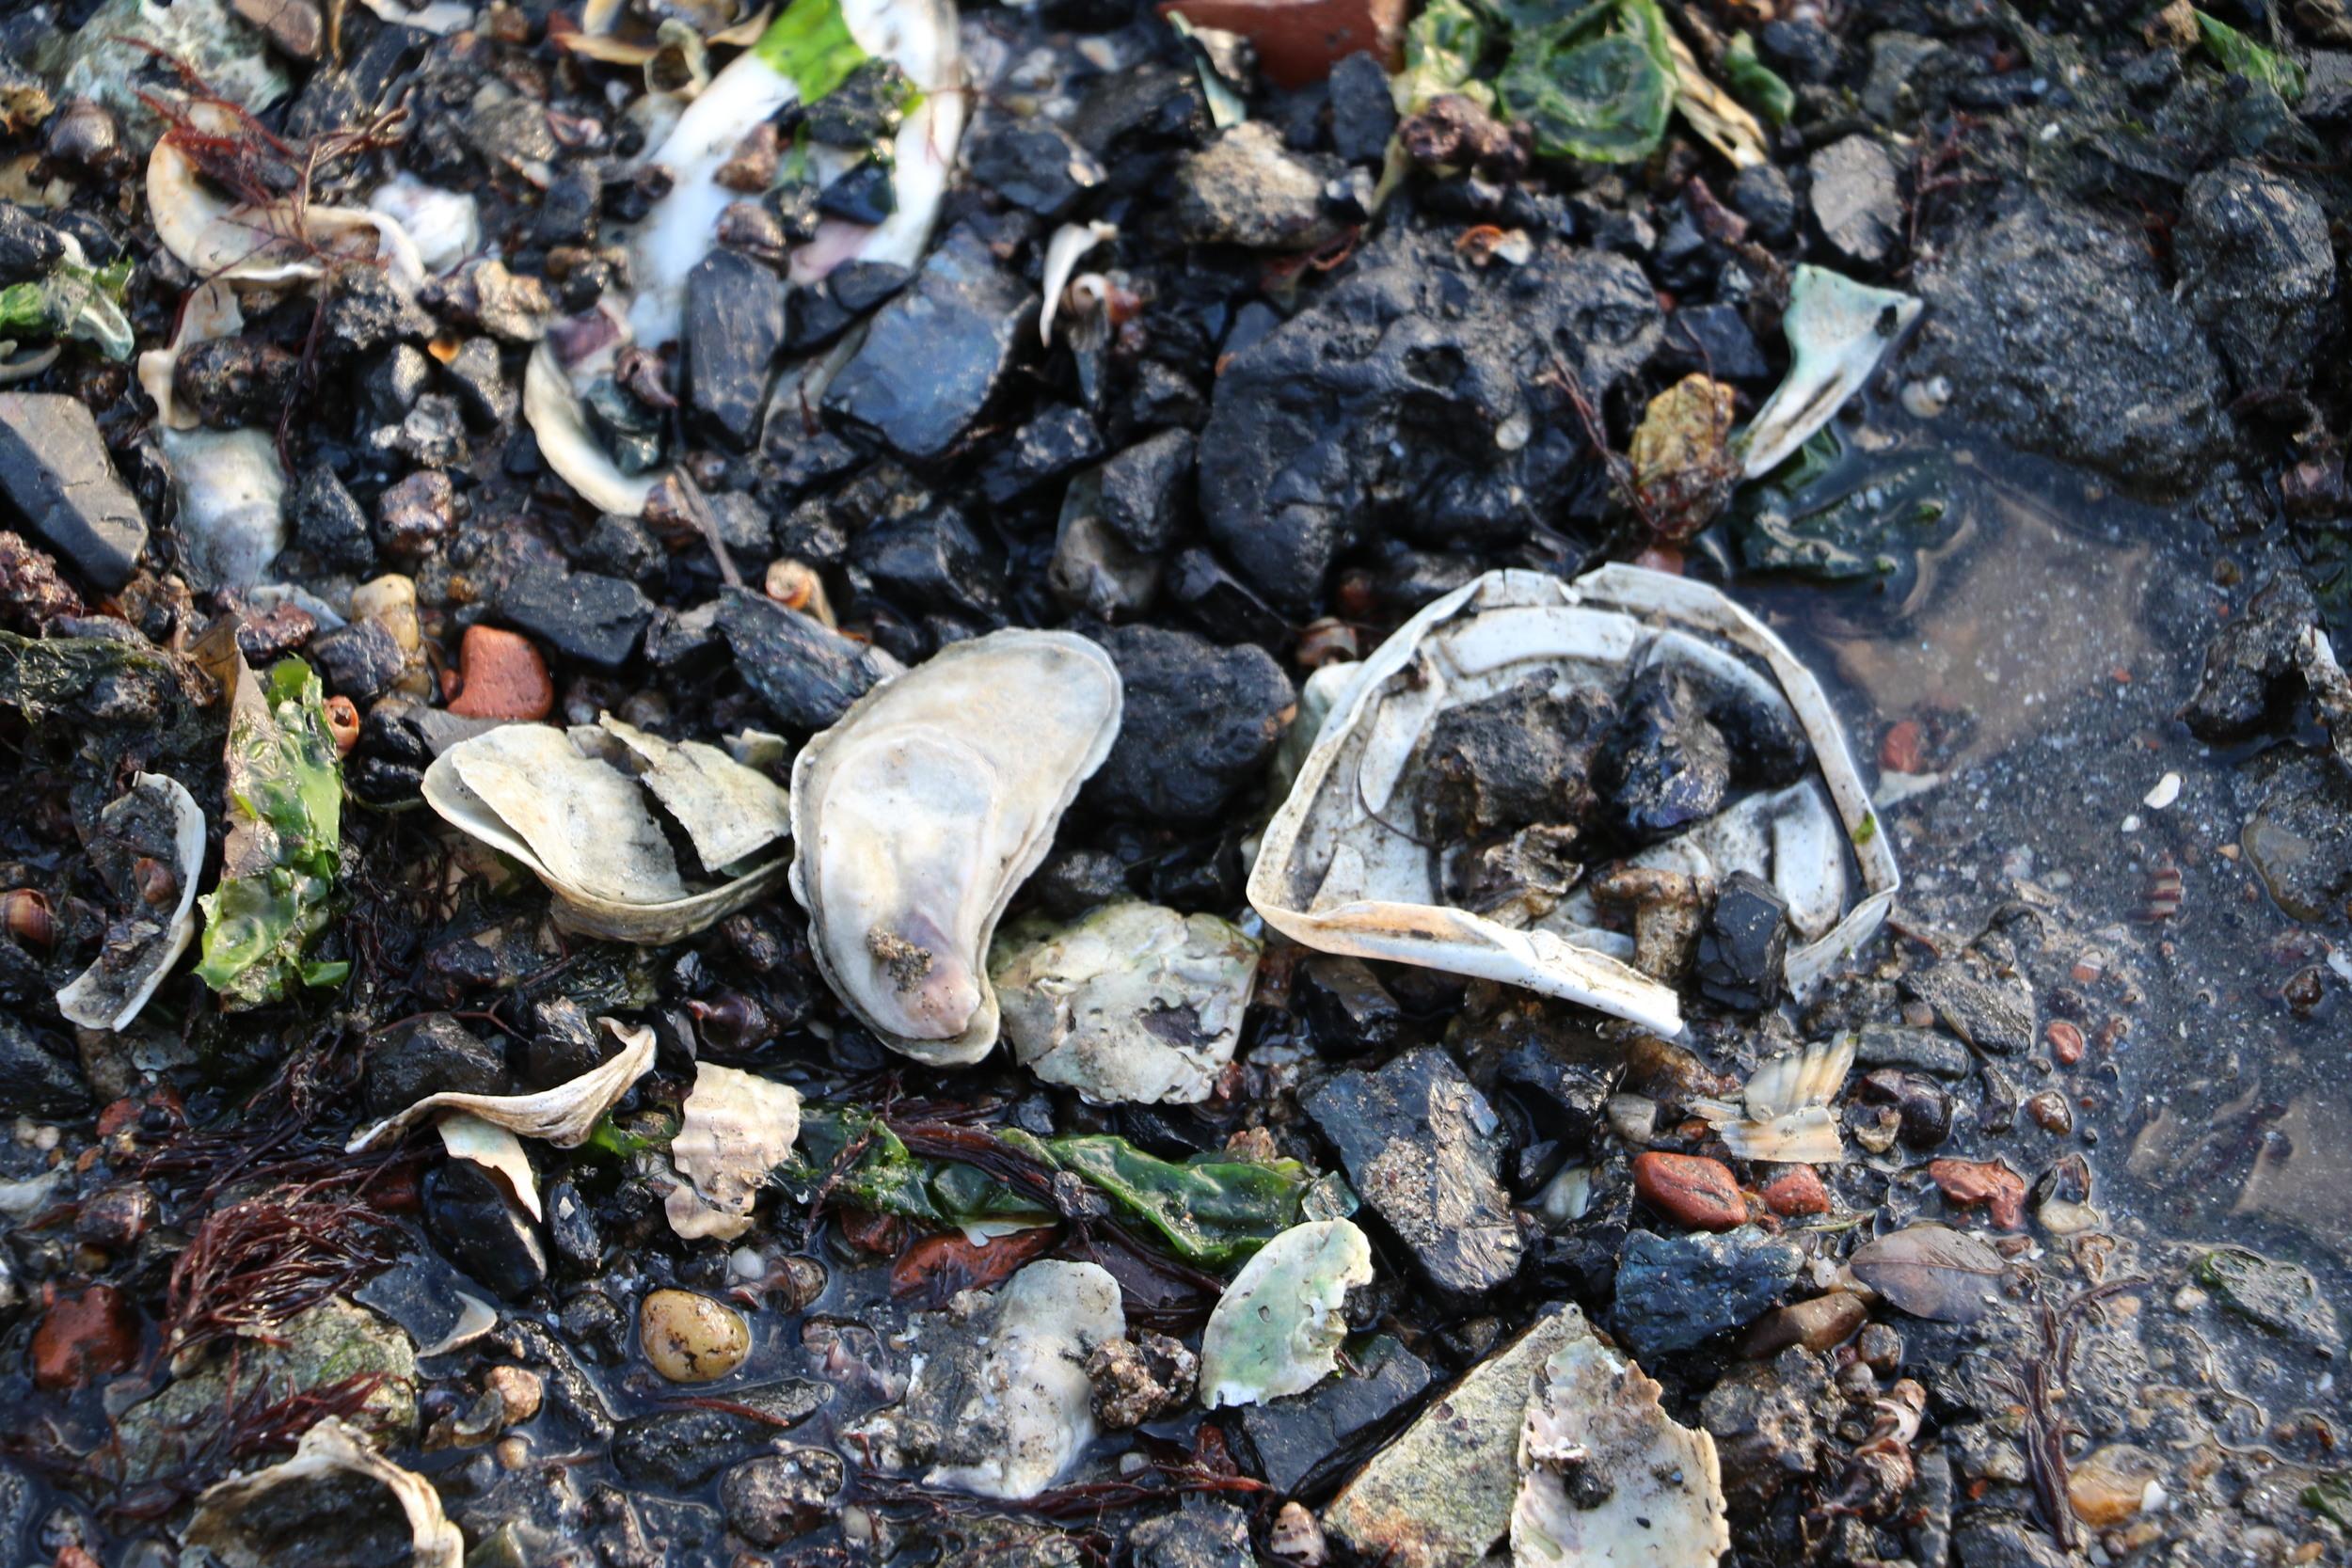 Shells and a Plastic Coffee Lid, Photo Credit: Liz Summit, 2015